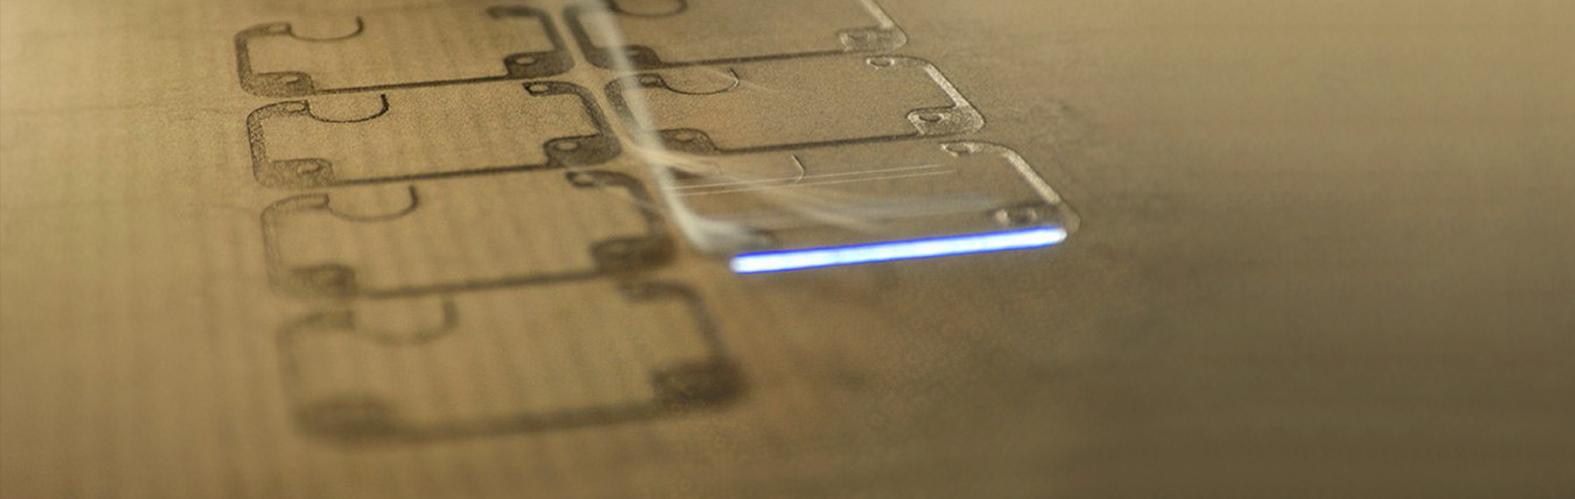 پرینت سه بعدی SLM